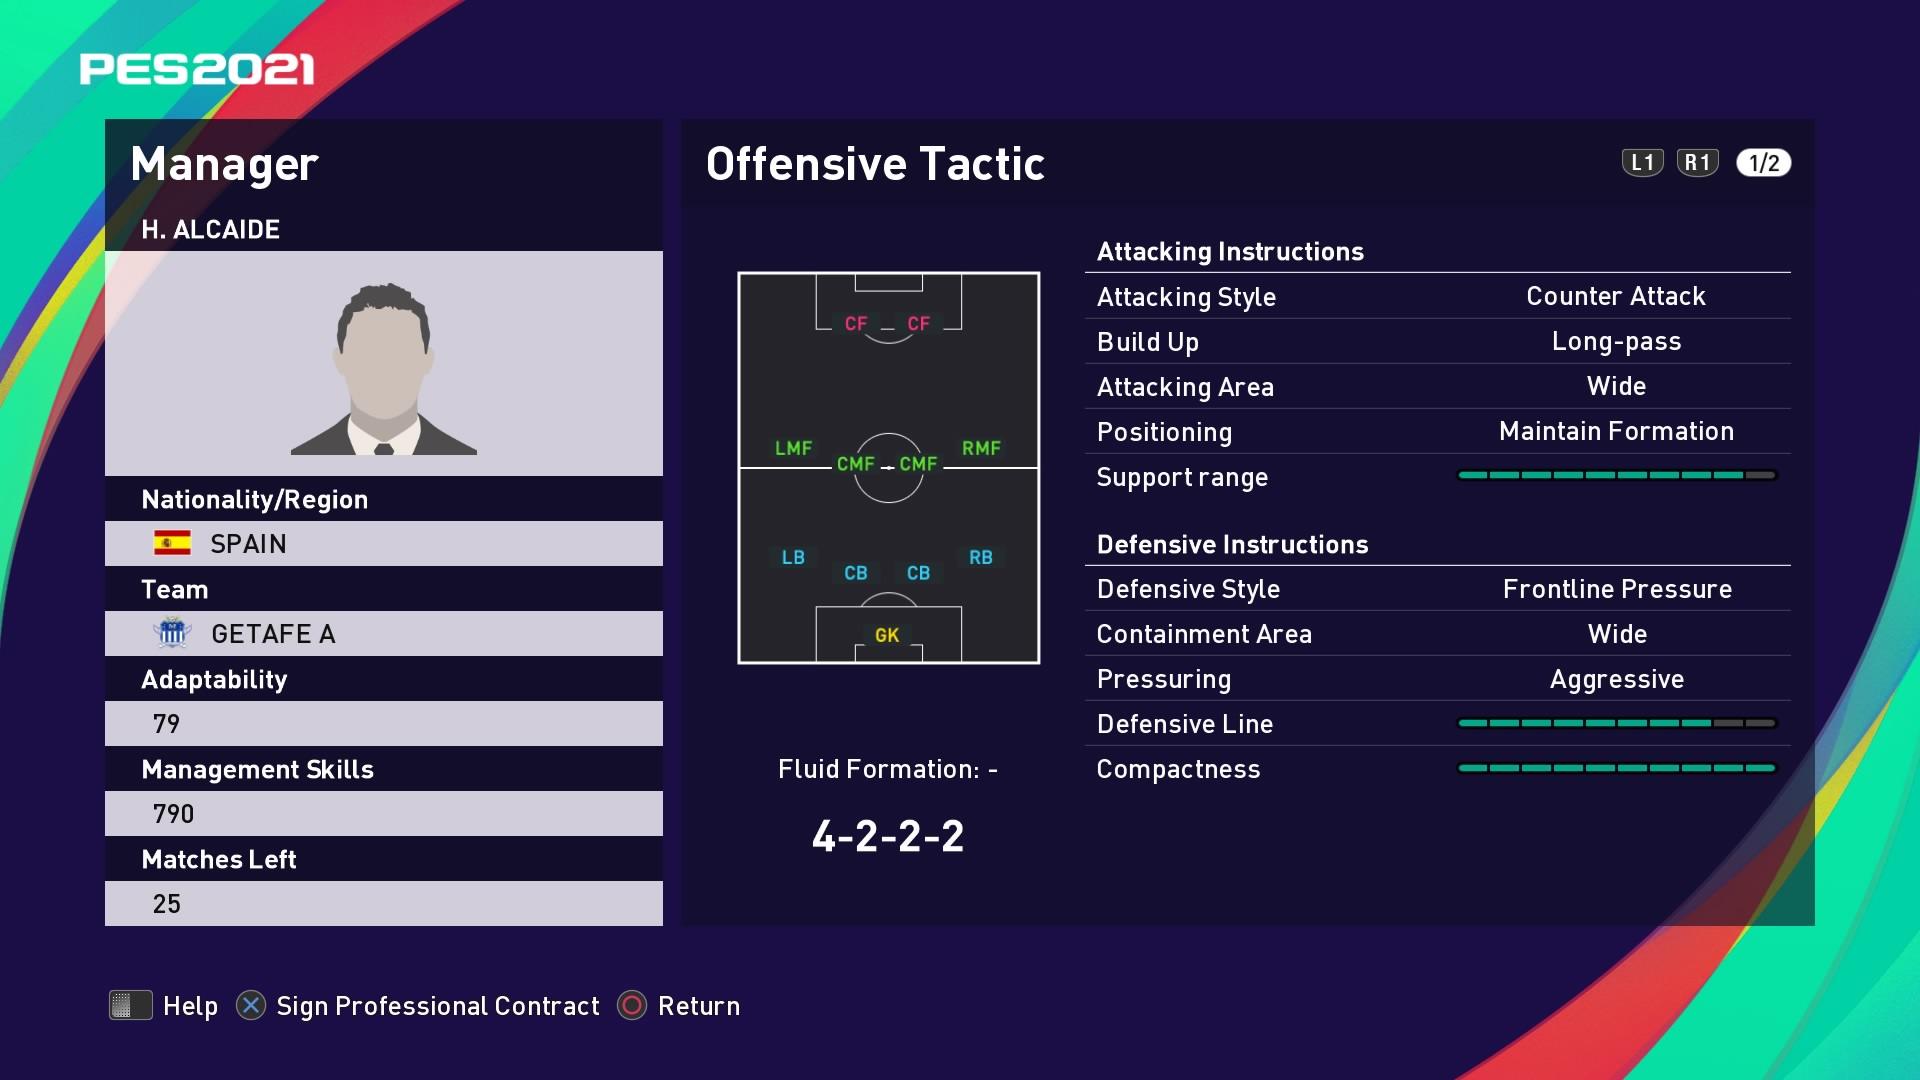 H. Alcaide (José Bordalás) Offensive Tactic in PES 2021 myClub